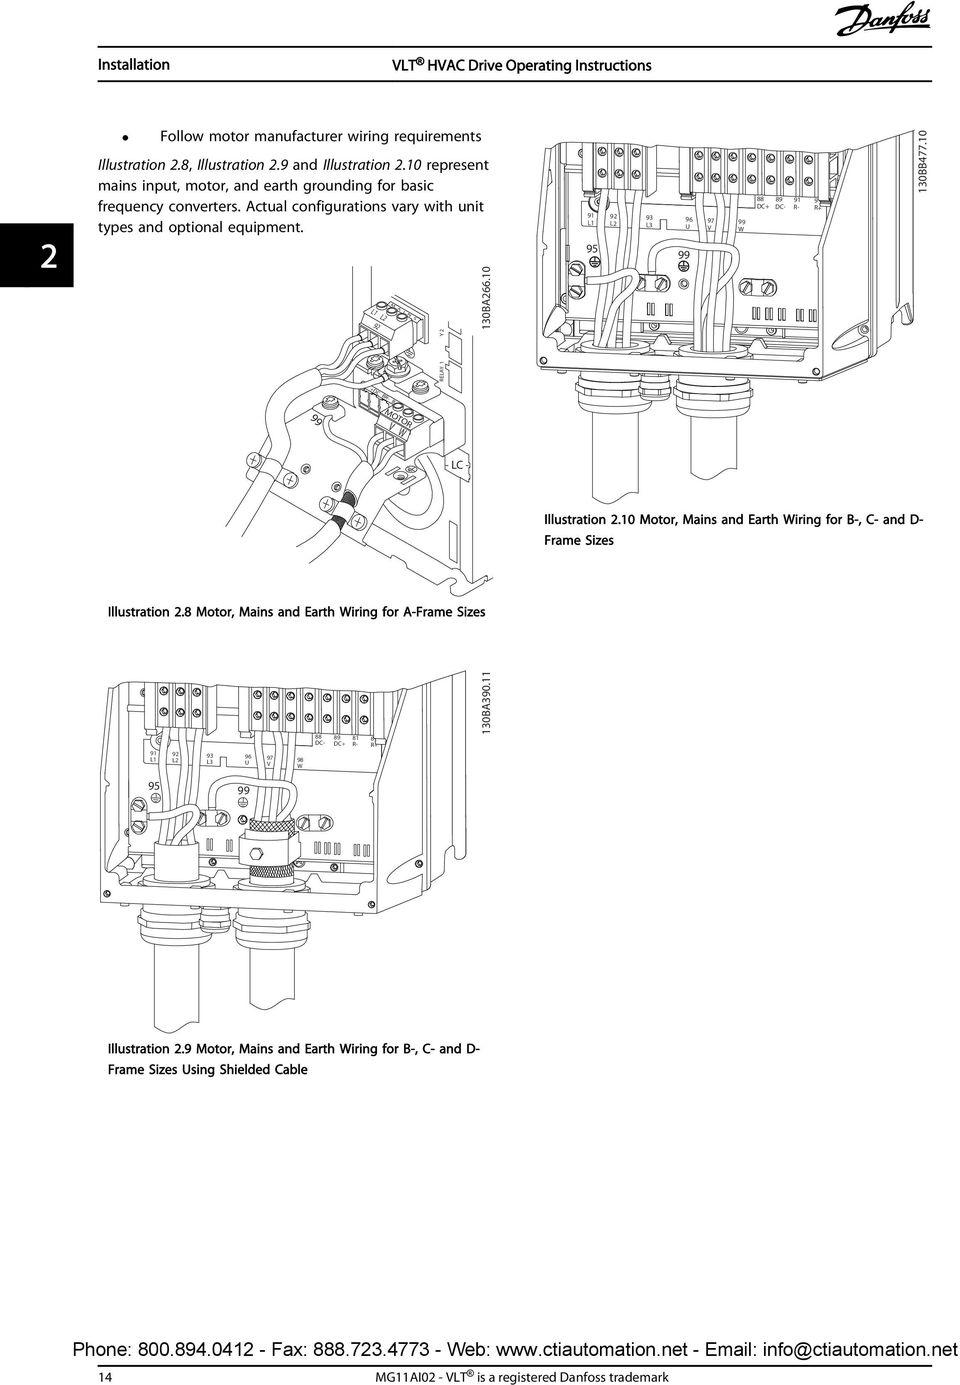 medium resolution of danfoss vlt hvac wiring diagram operating instructions vlt hvac drive fc 102 kw